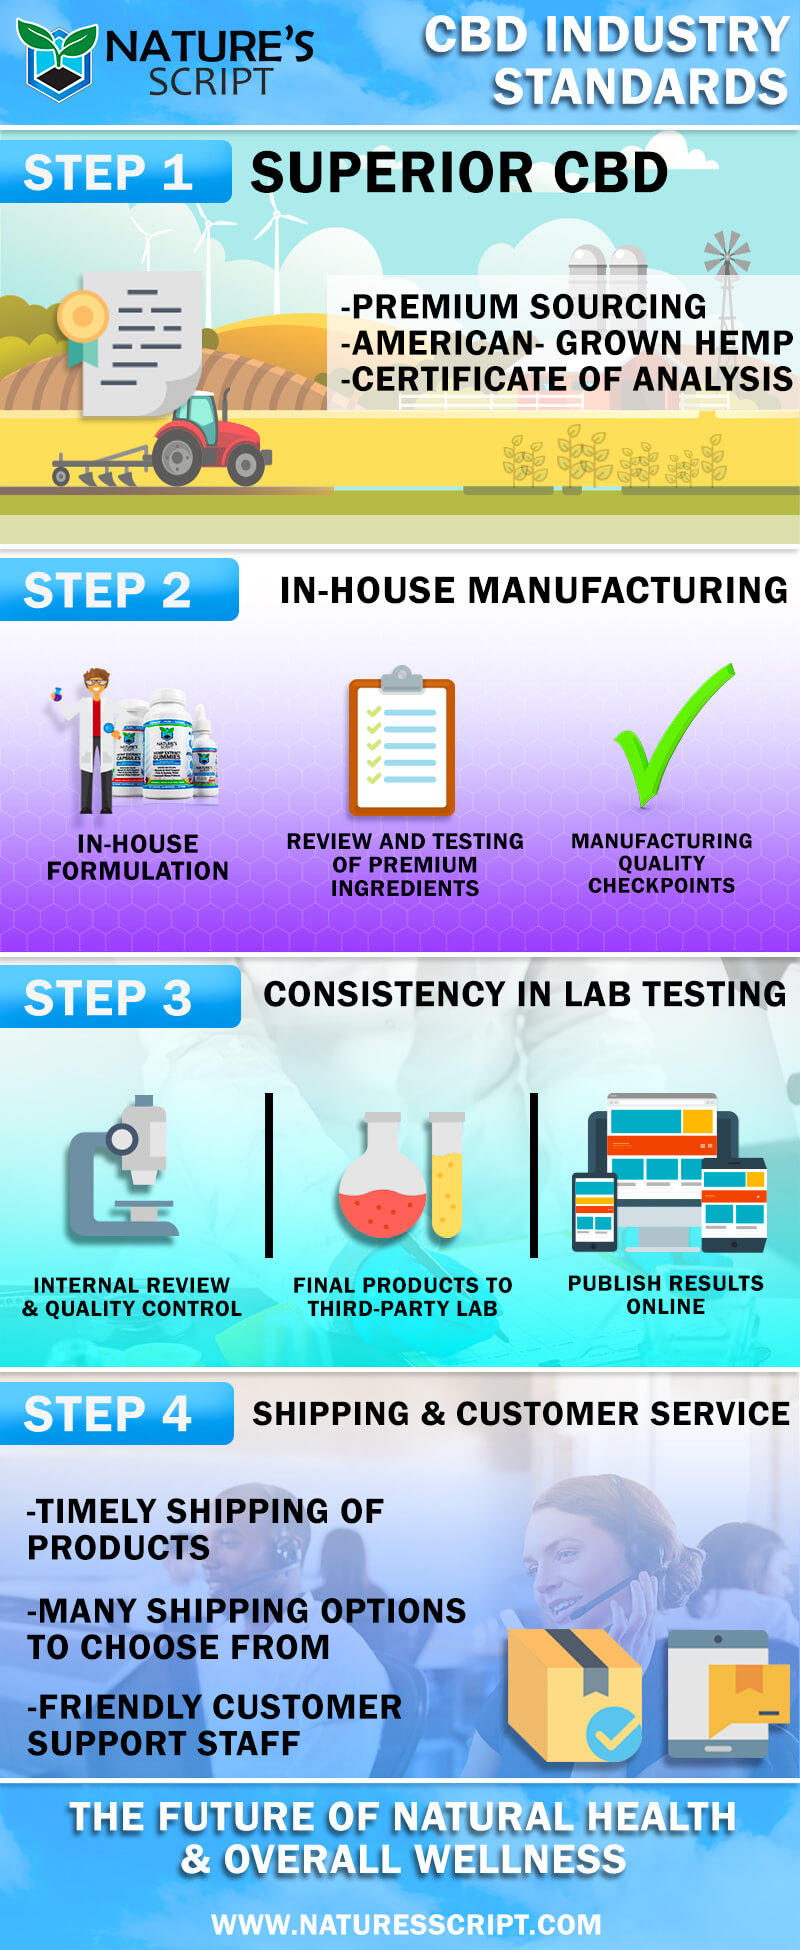 cbd industry standard infographic natures script